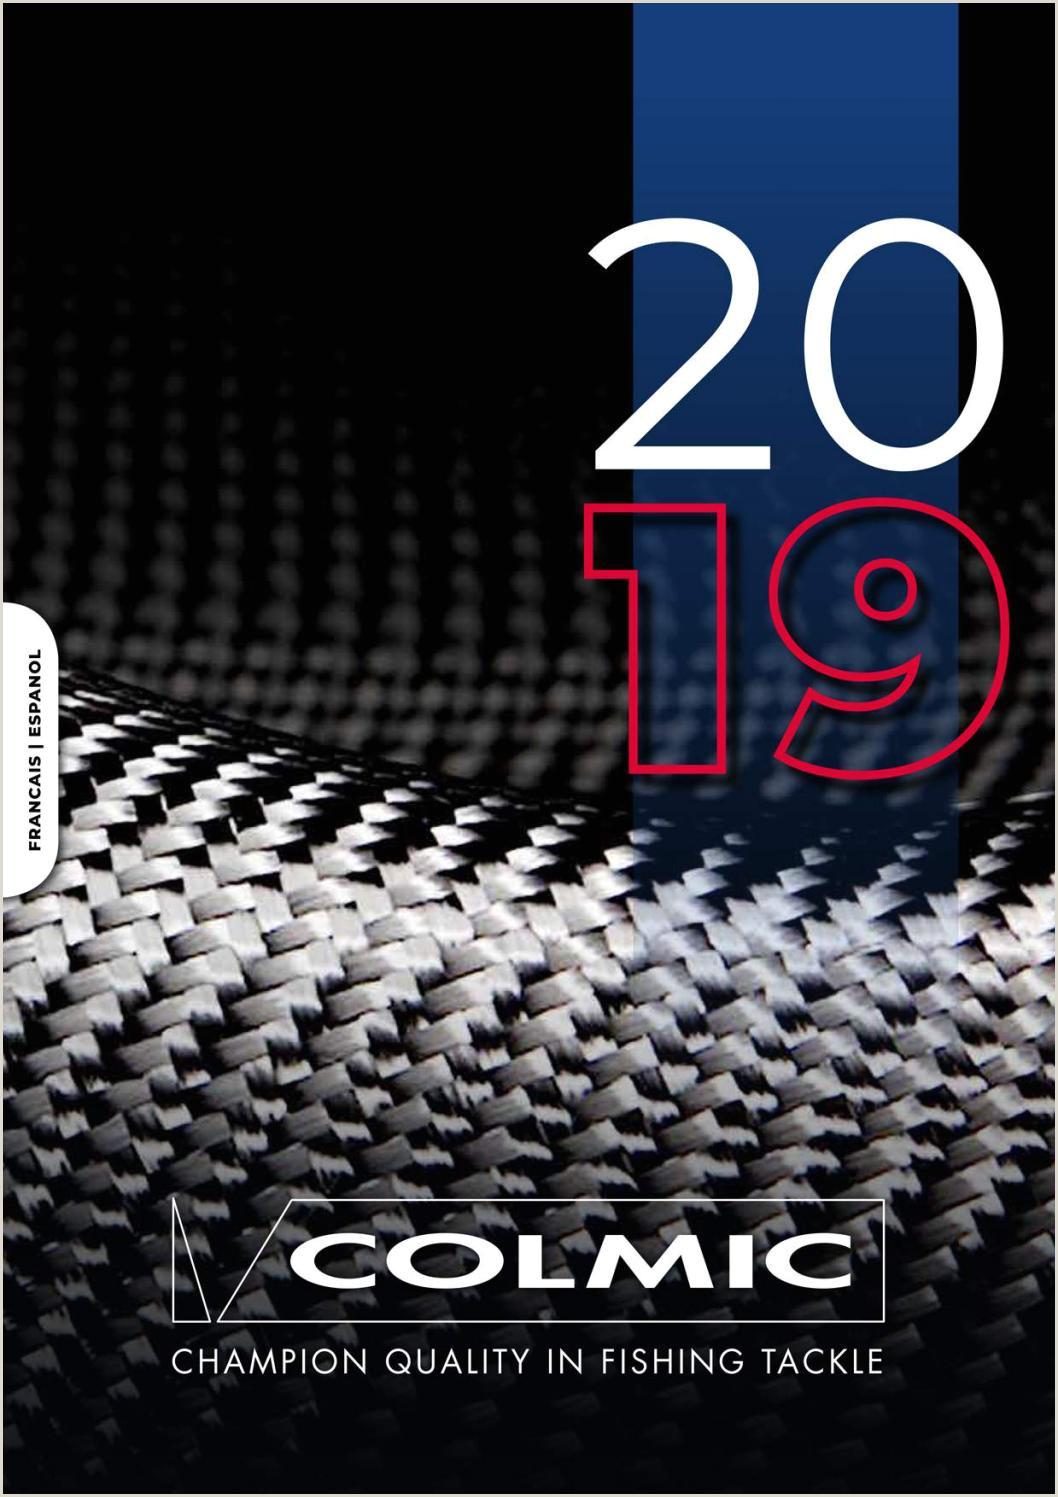 Formato Hoja De Vida Blanco Y Negro Colmic2019 Fraspa by Colmic issuu